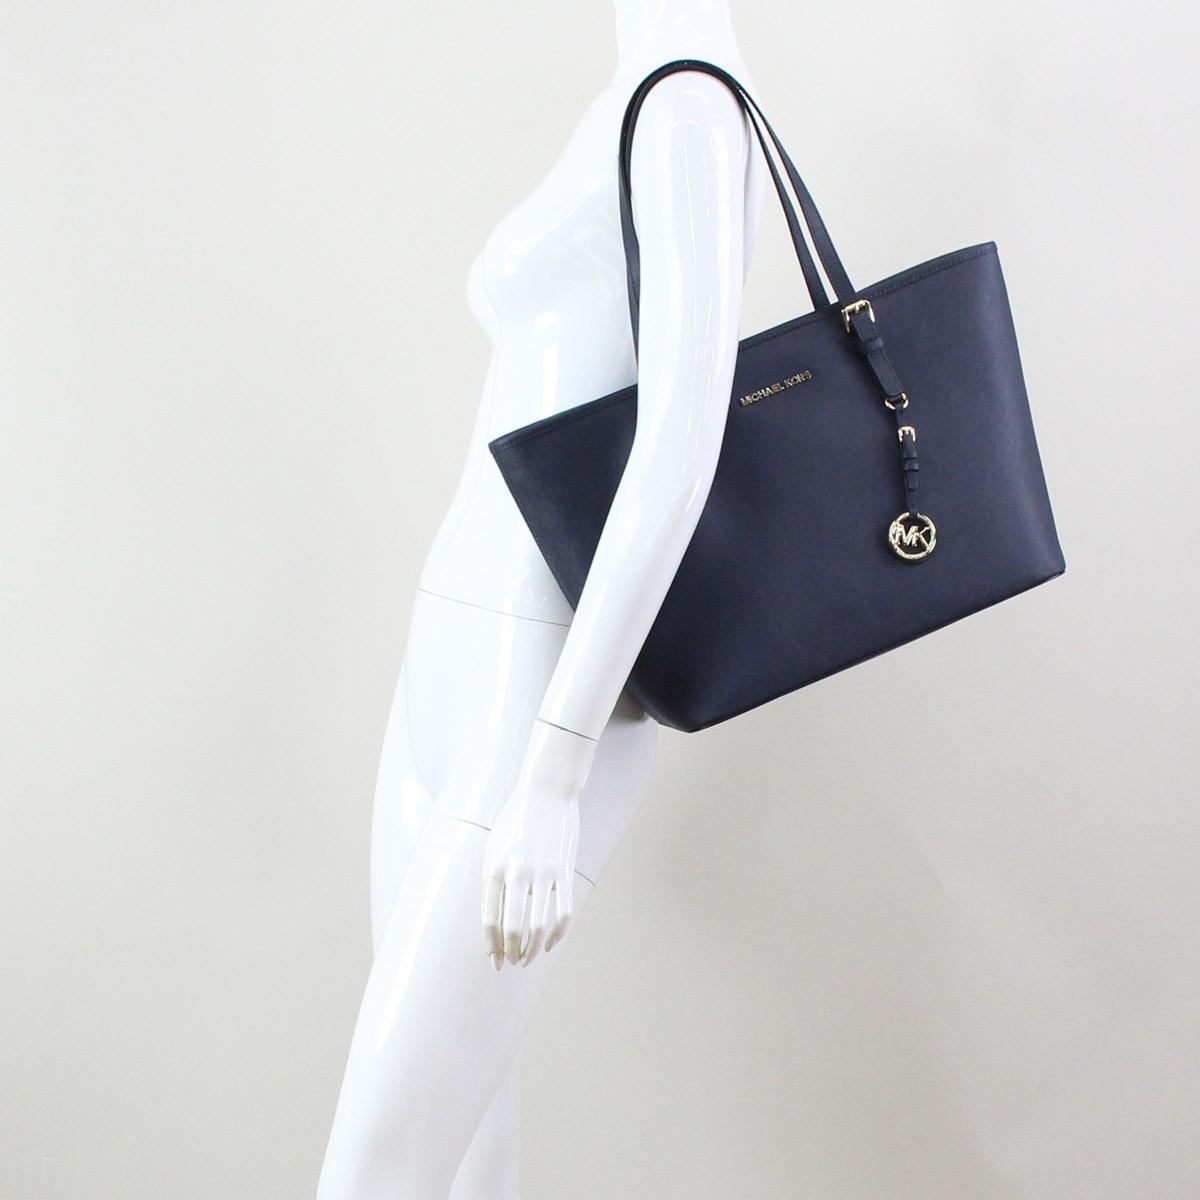 945931b41c8c Bighit The total brand wholesale: Michael Kors MICHAEL KORS bag JET ...